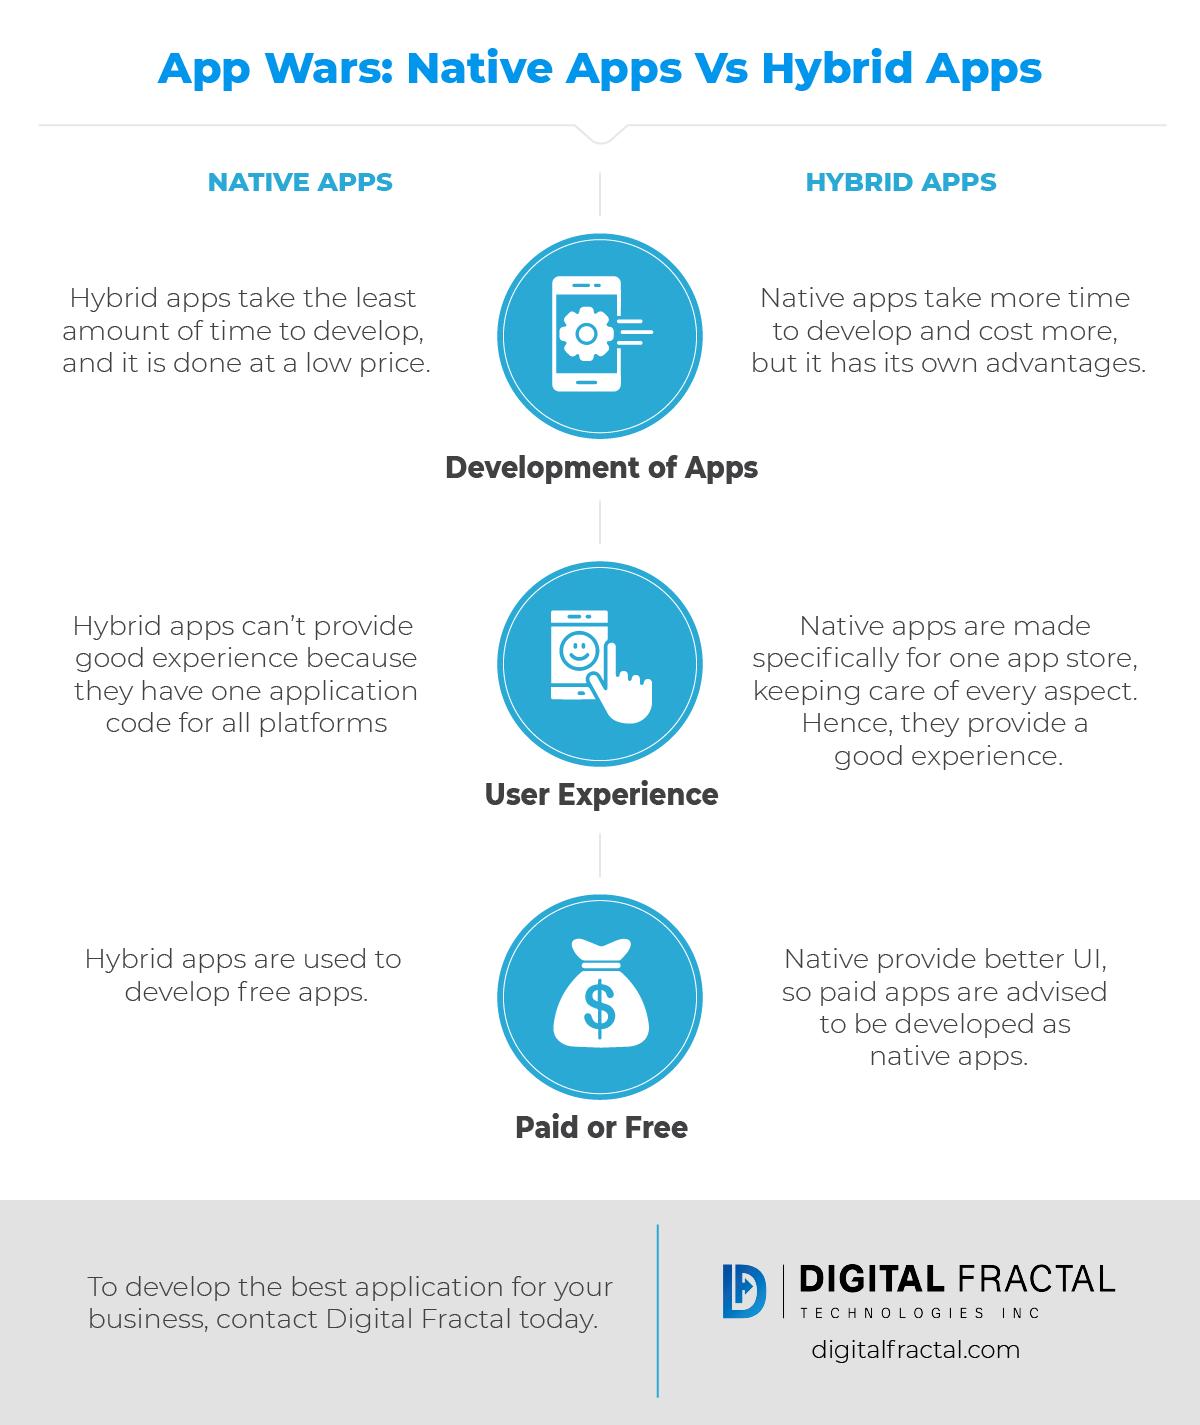 App Wars-Native Apps Vs Hybrid Apps